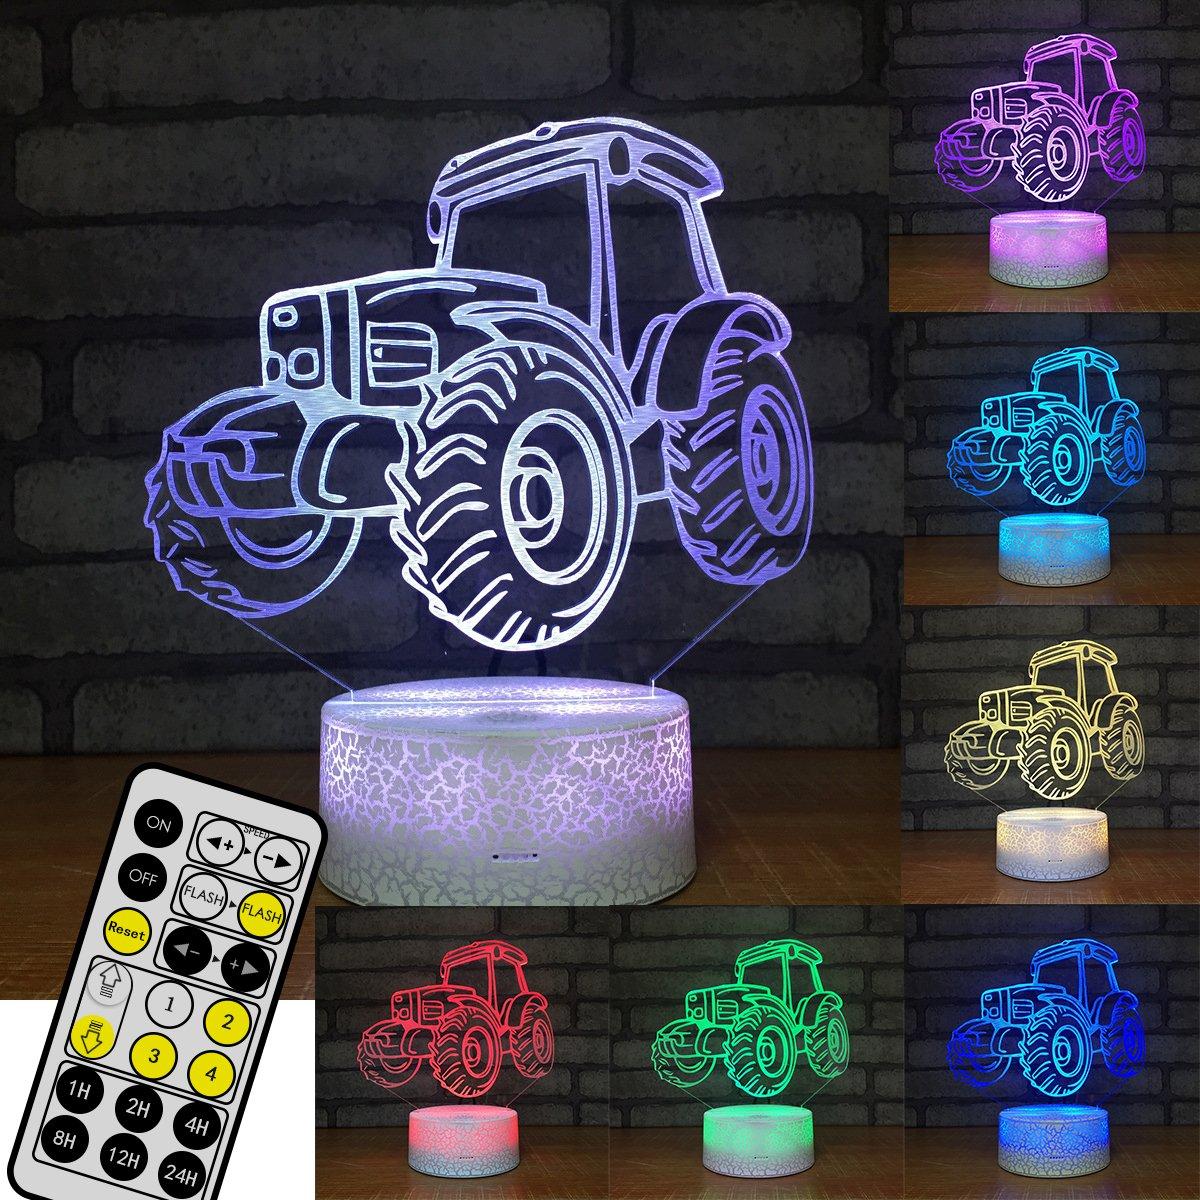 Tractor Led Novedad Illusion Night Car 3d Efecto Light OPknXw80